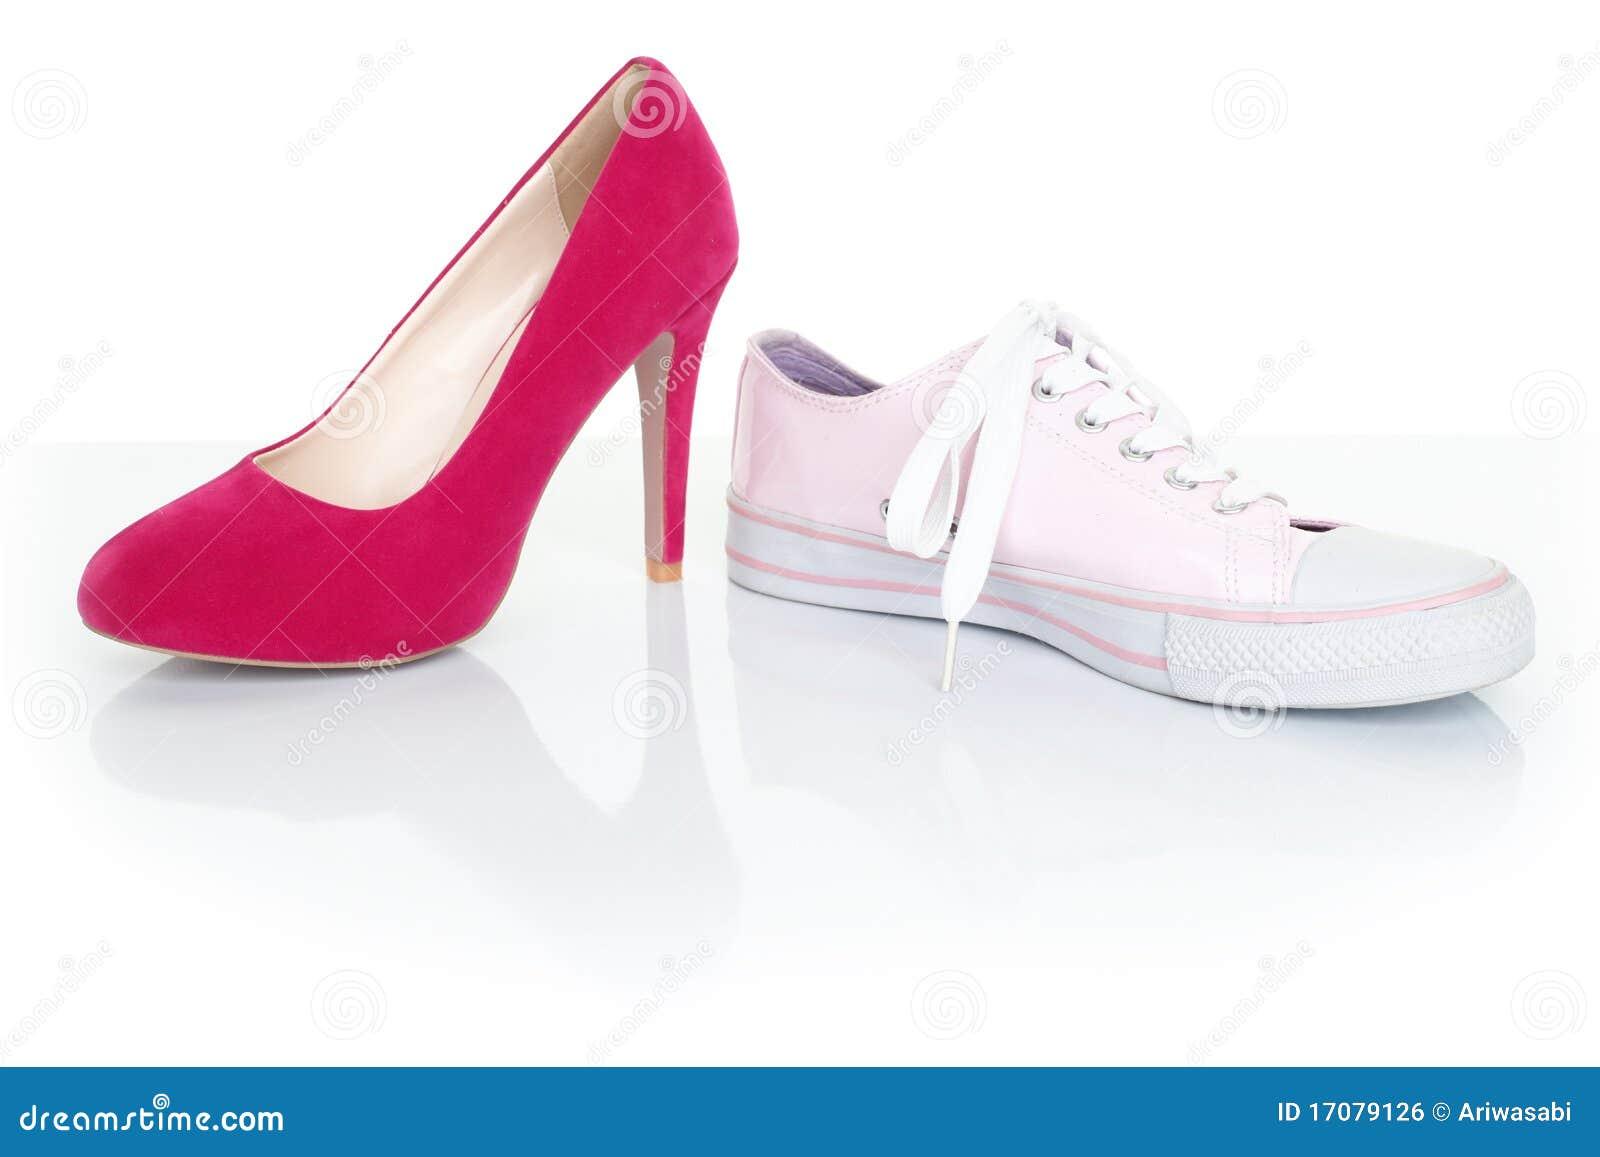 Decision / choice concept - women shoes on white